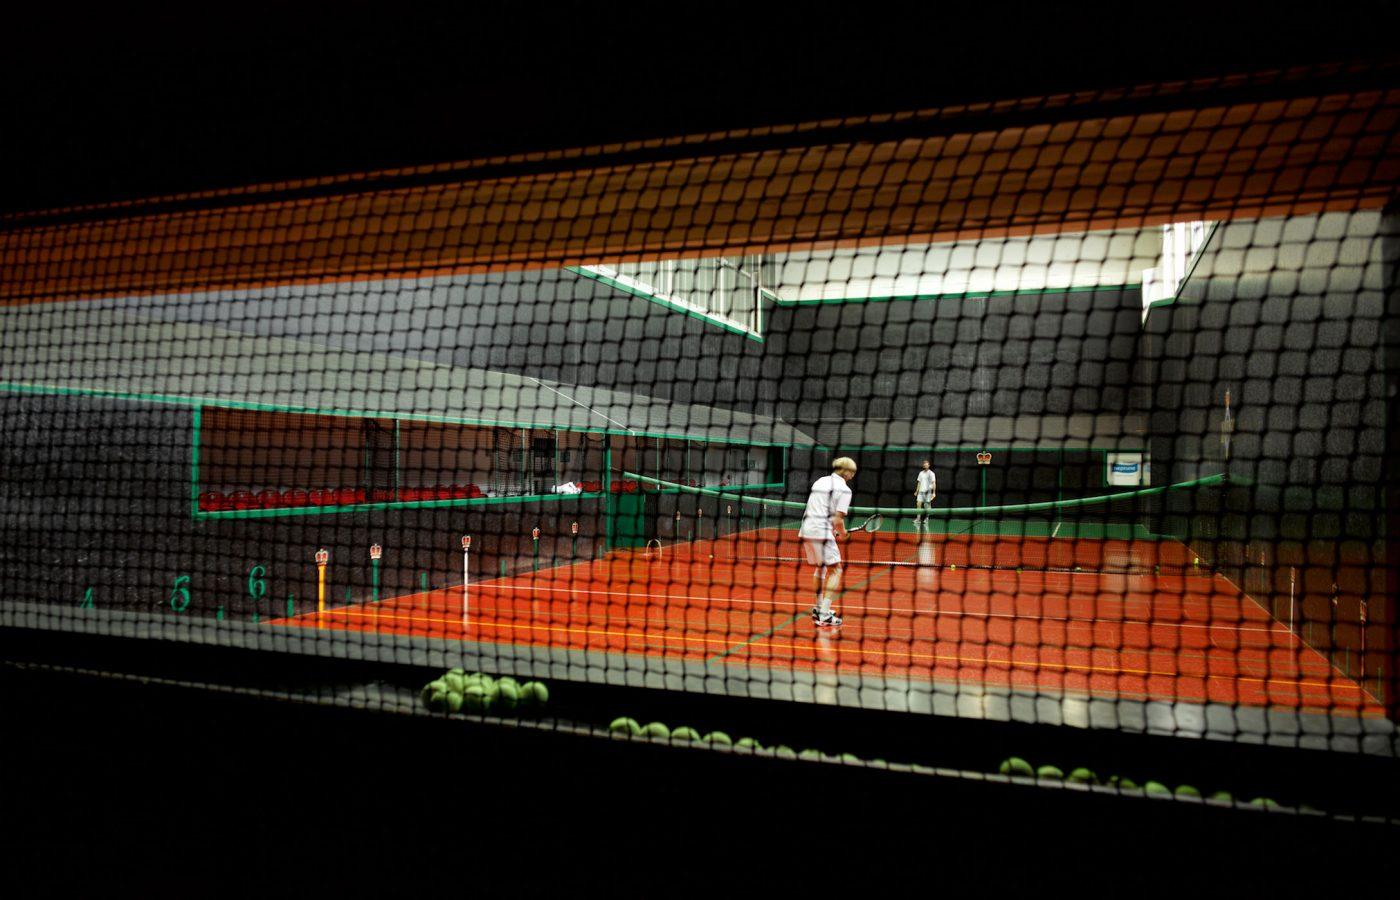 Queens Club Real Tennis Court